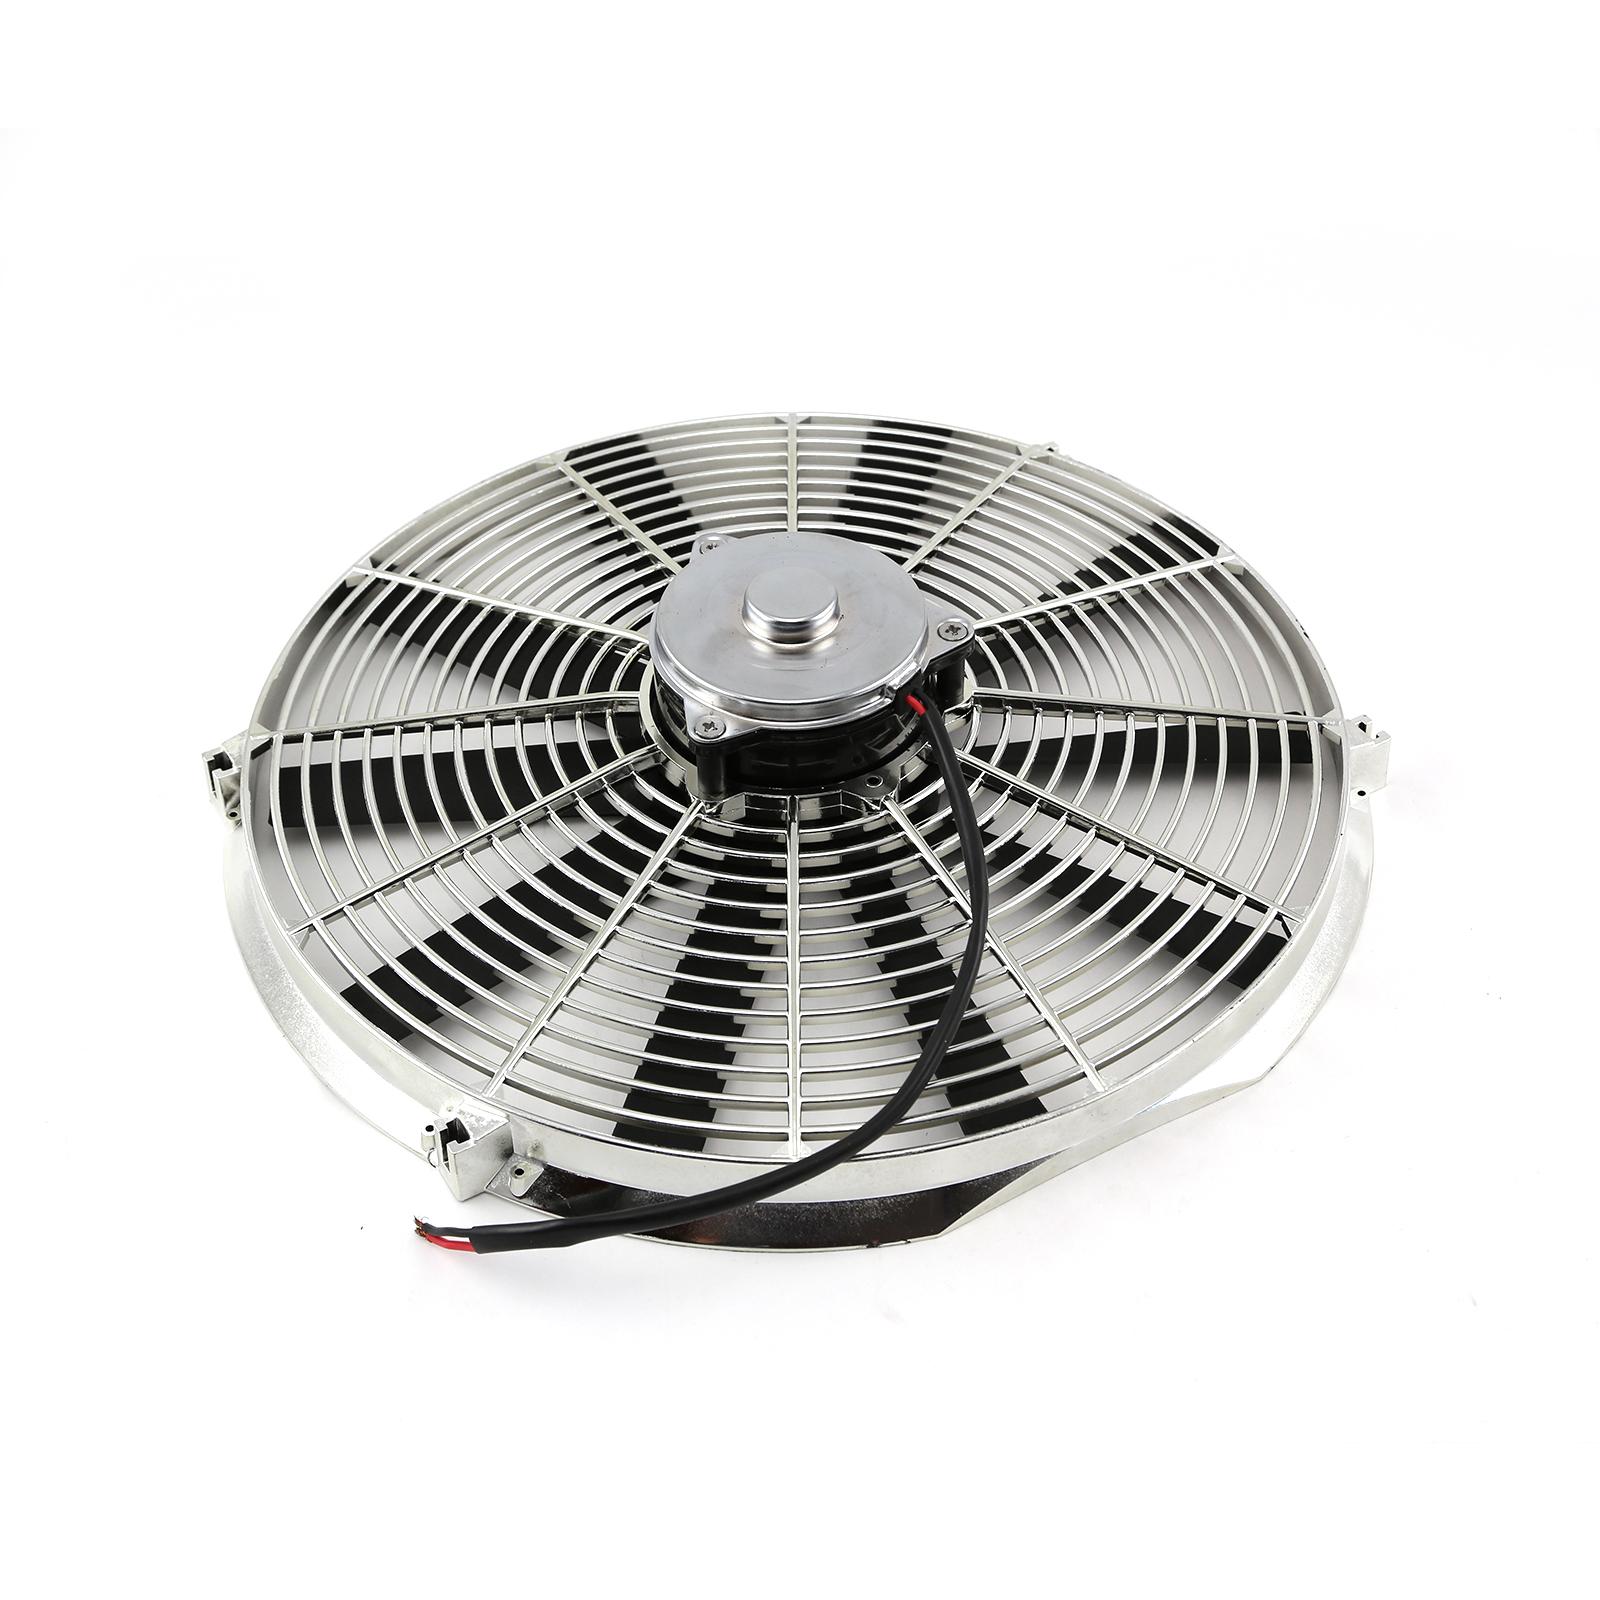 12v Blower Fan 500 Cfm : Quot reversable v radiator electric thermo fan big